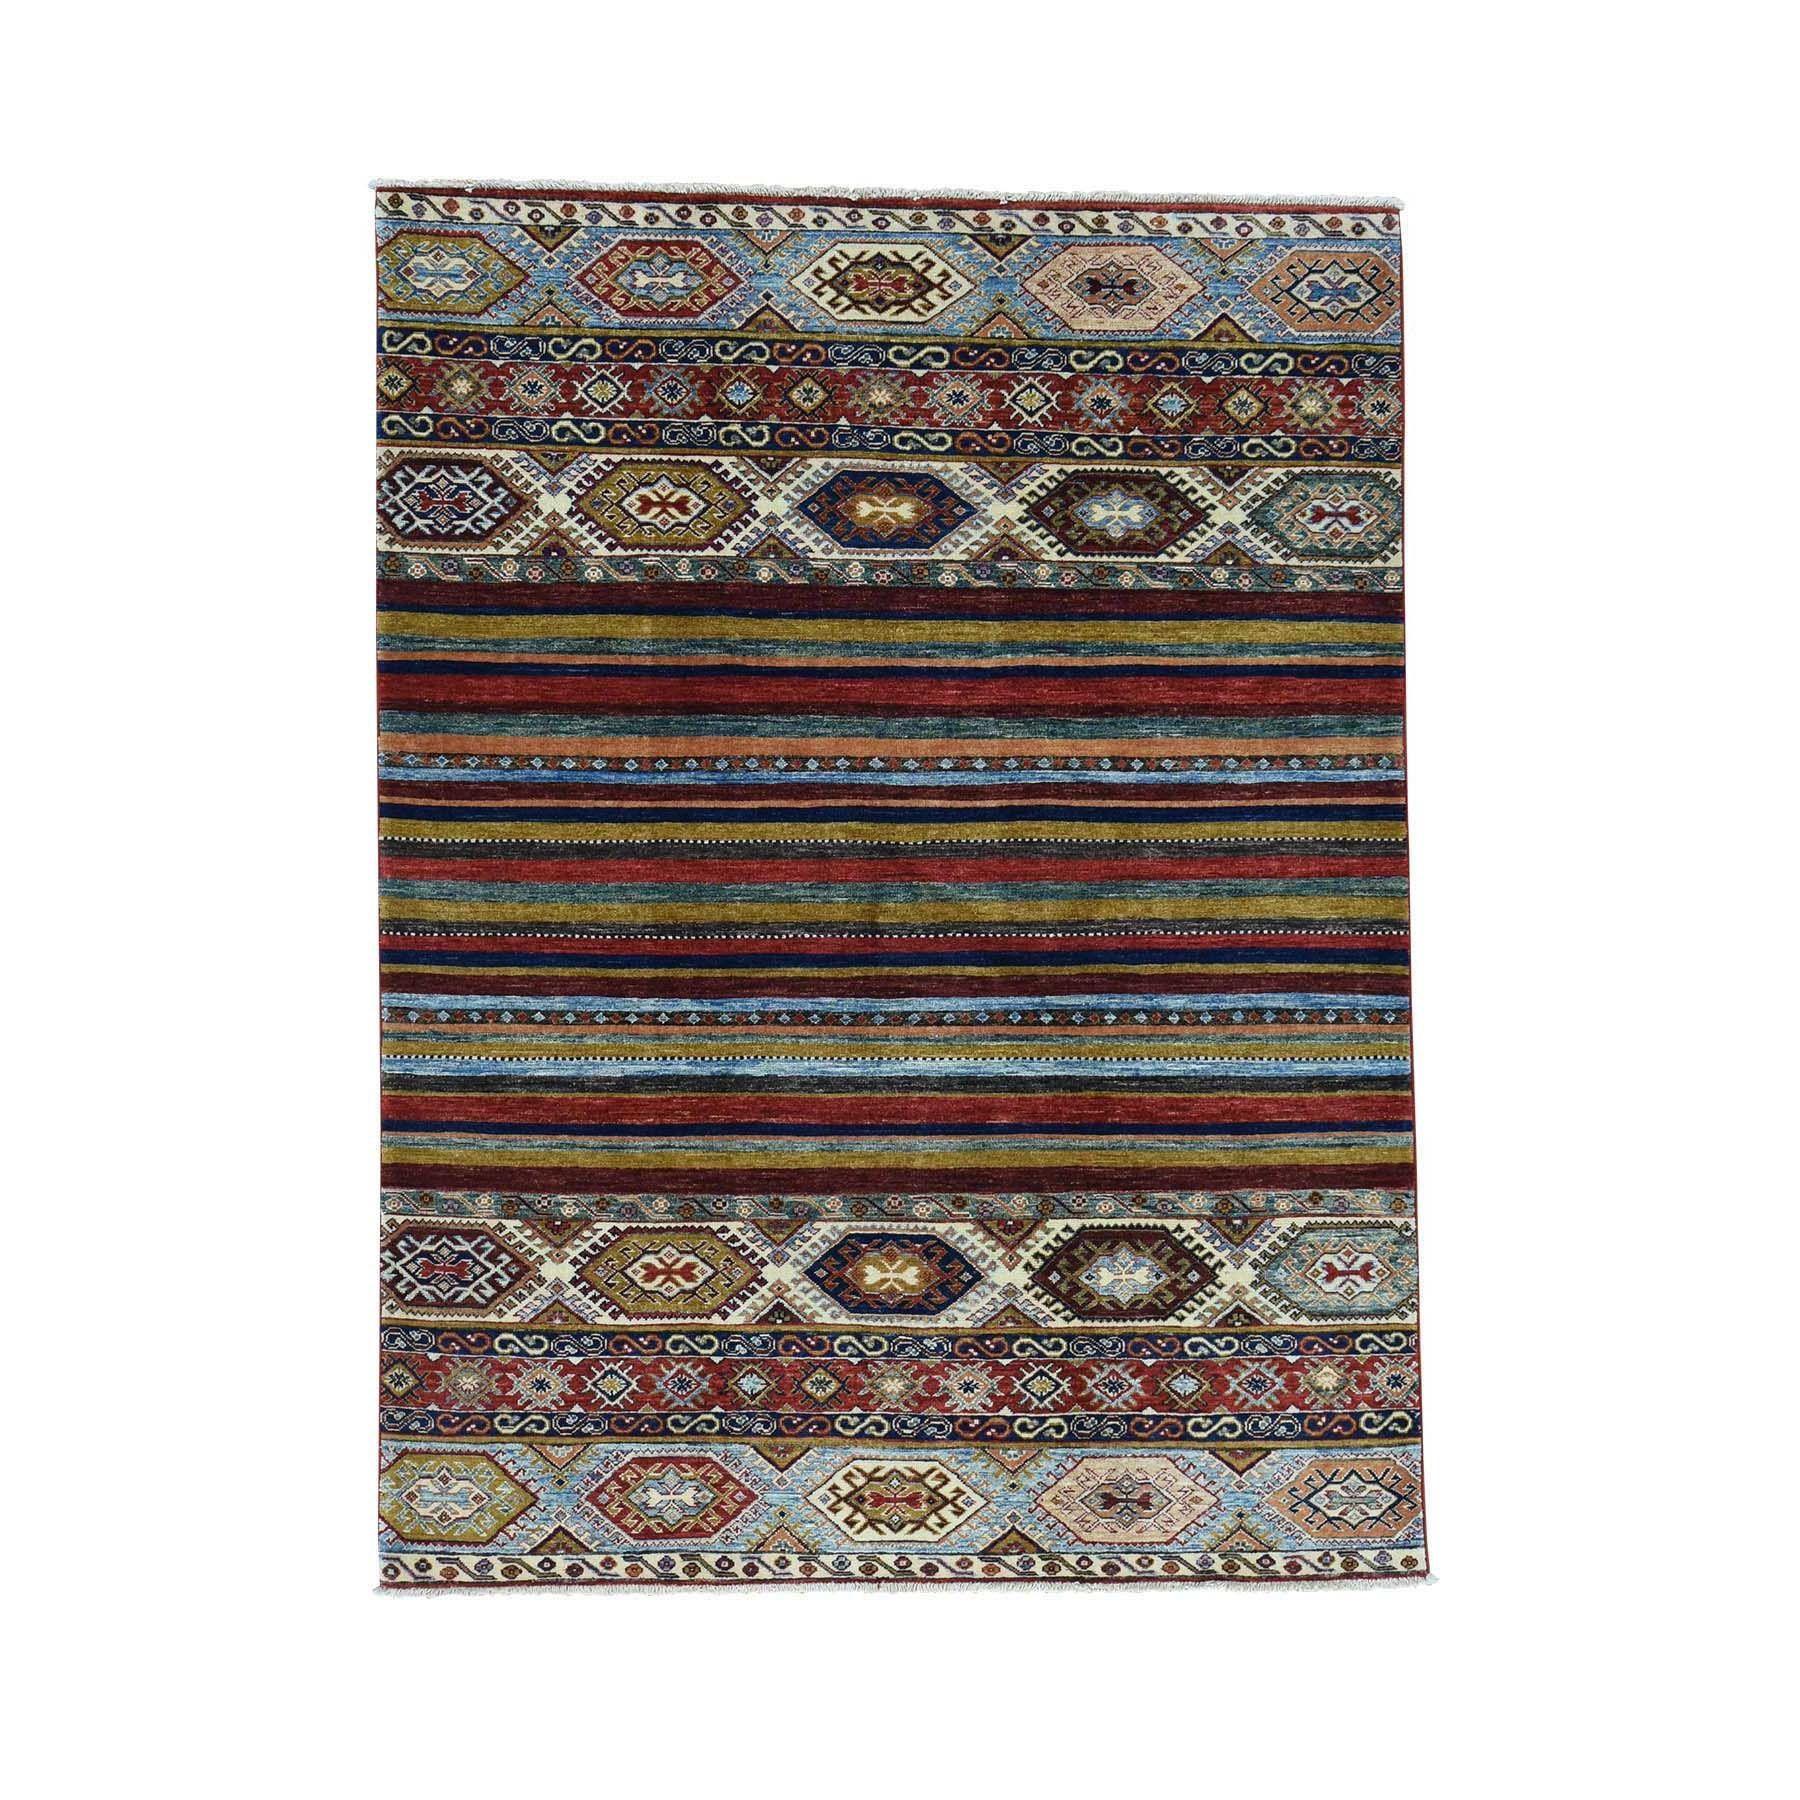 "1800getarug Handmade Super Kazak Khorjin Design Pure Wool Oriental Rug (5'0x6'8) (Exact Size: 5'0"" x 6'8""), Multi, Size 5' x 7'"